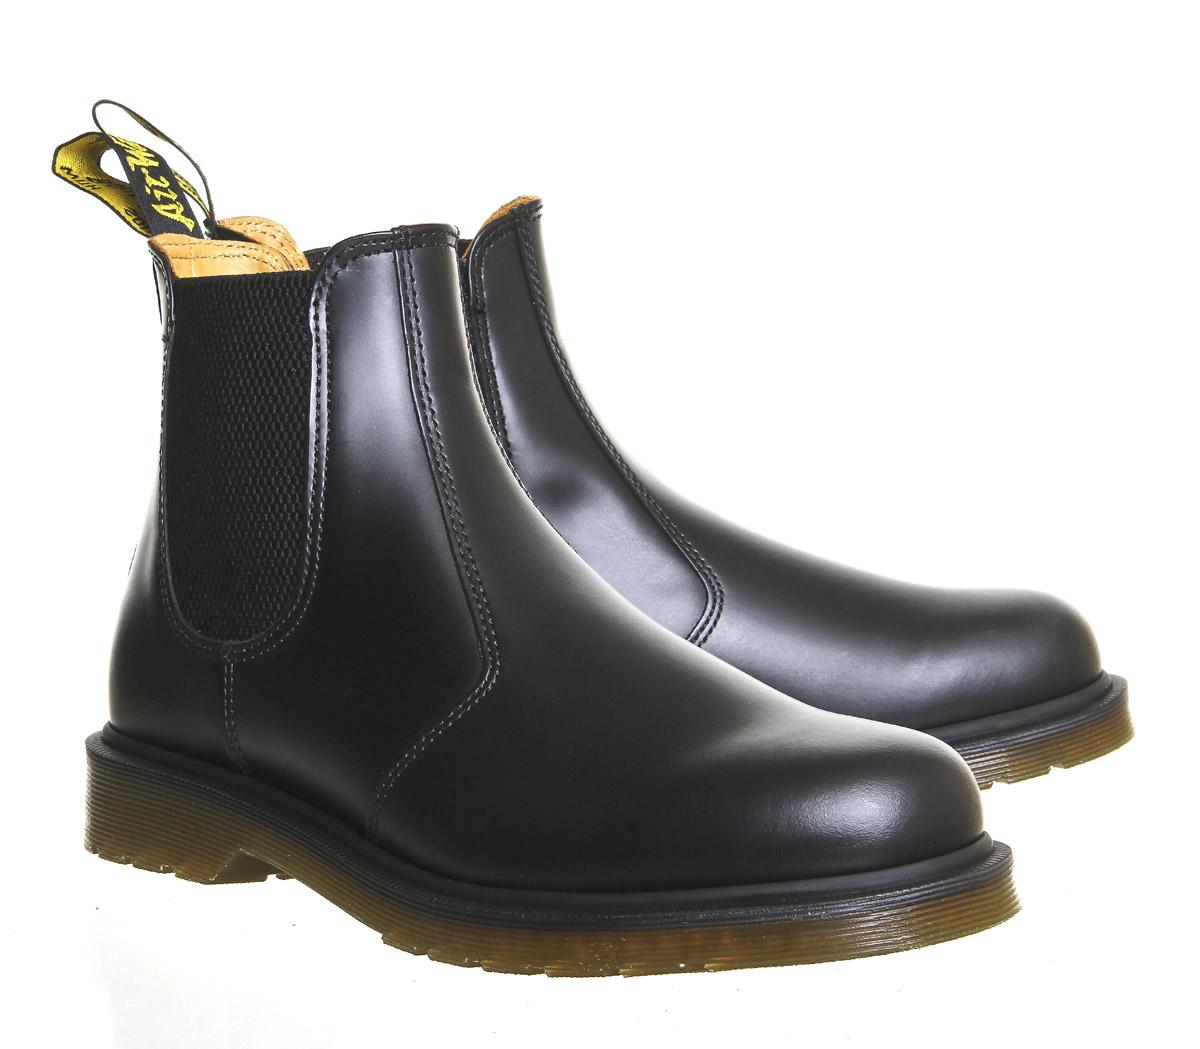 John Lobb Shoes >> Dr. Martens 2976 Chelsea Boots in Black for Men - Lyst